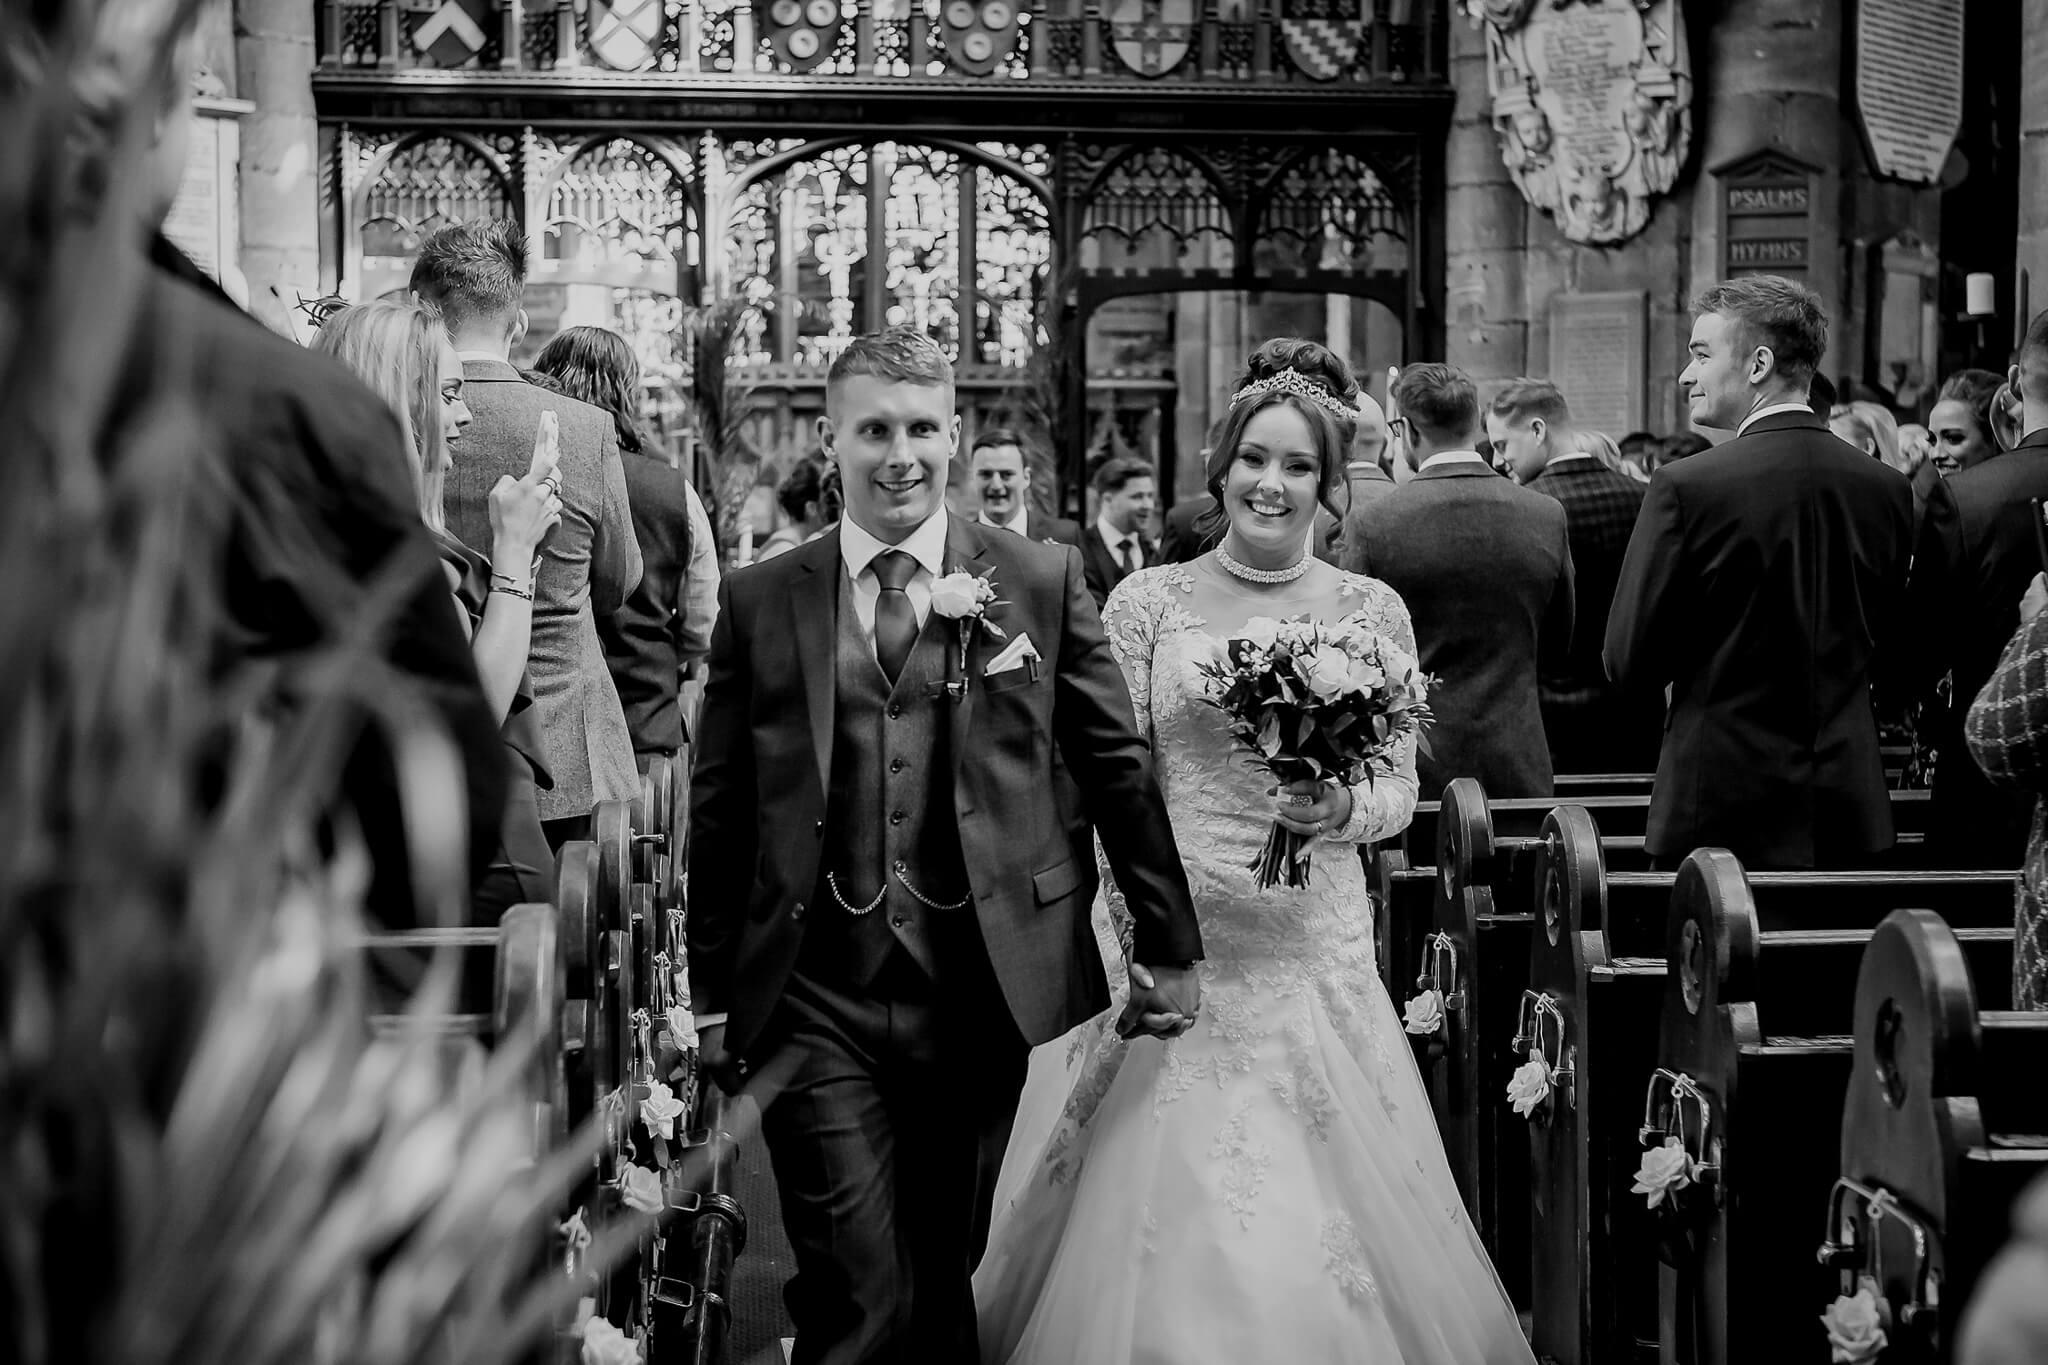 bride-groom-walk-down-aisle-stanbury-potography-wigan